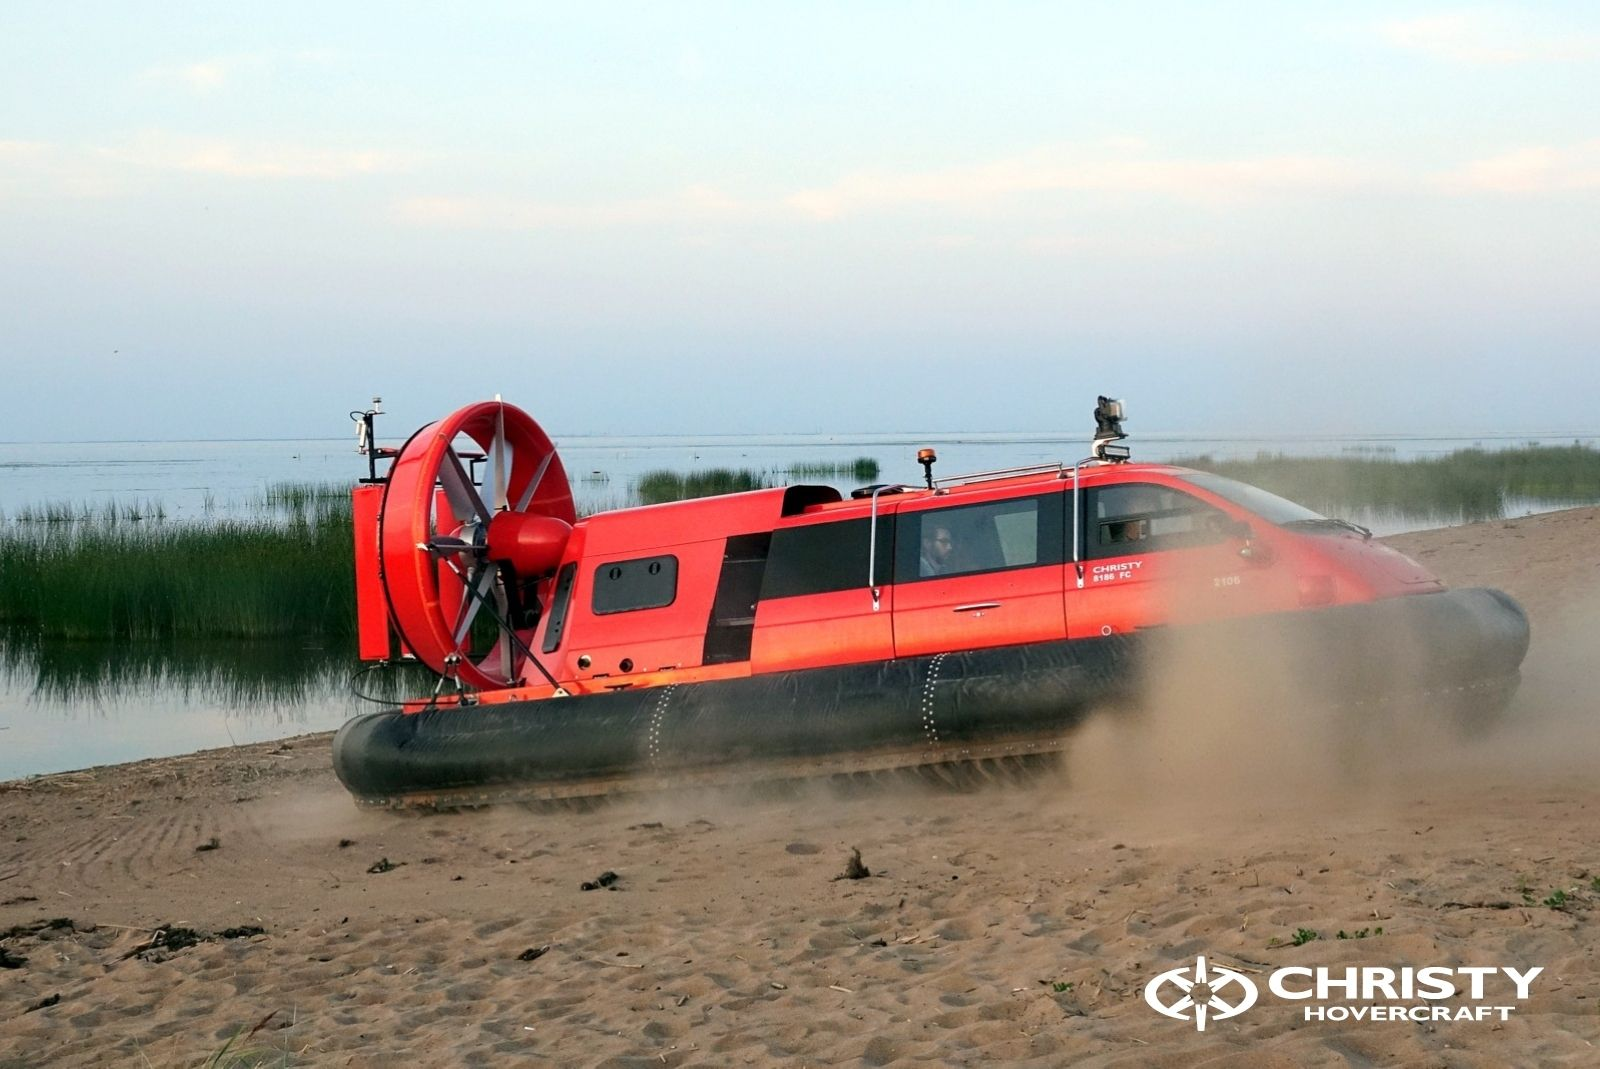 Тест-драйв катера-амфибии Christy 8186 FC Duct для правительства Канады   фото №3